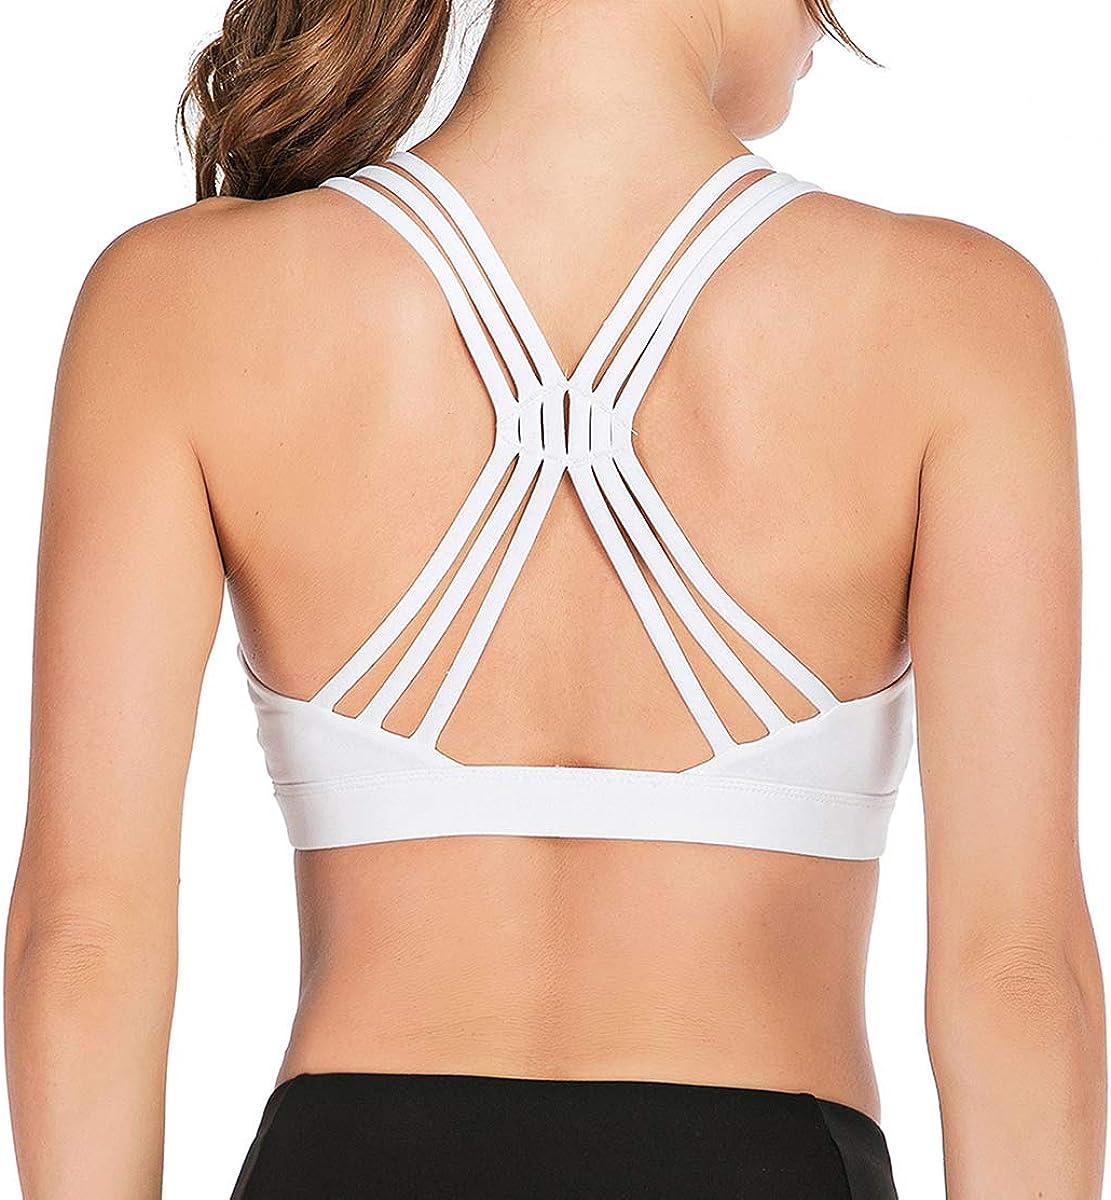 Lelinta Womens Padded Sports Bra Cross Back Bra Workout Strappy Bra Seamless Yoga Bra